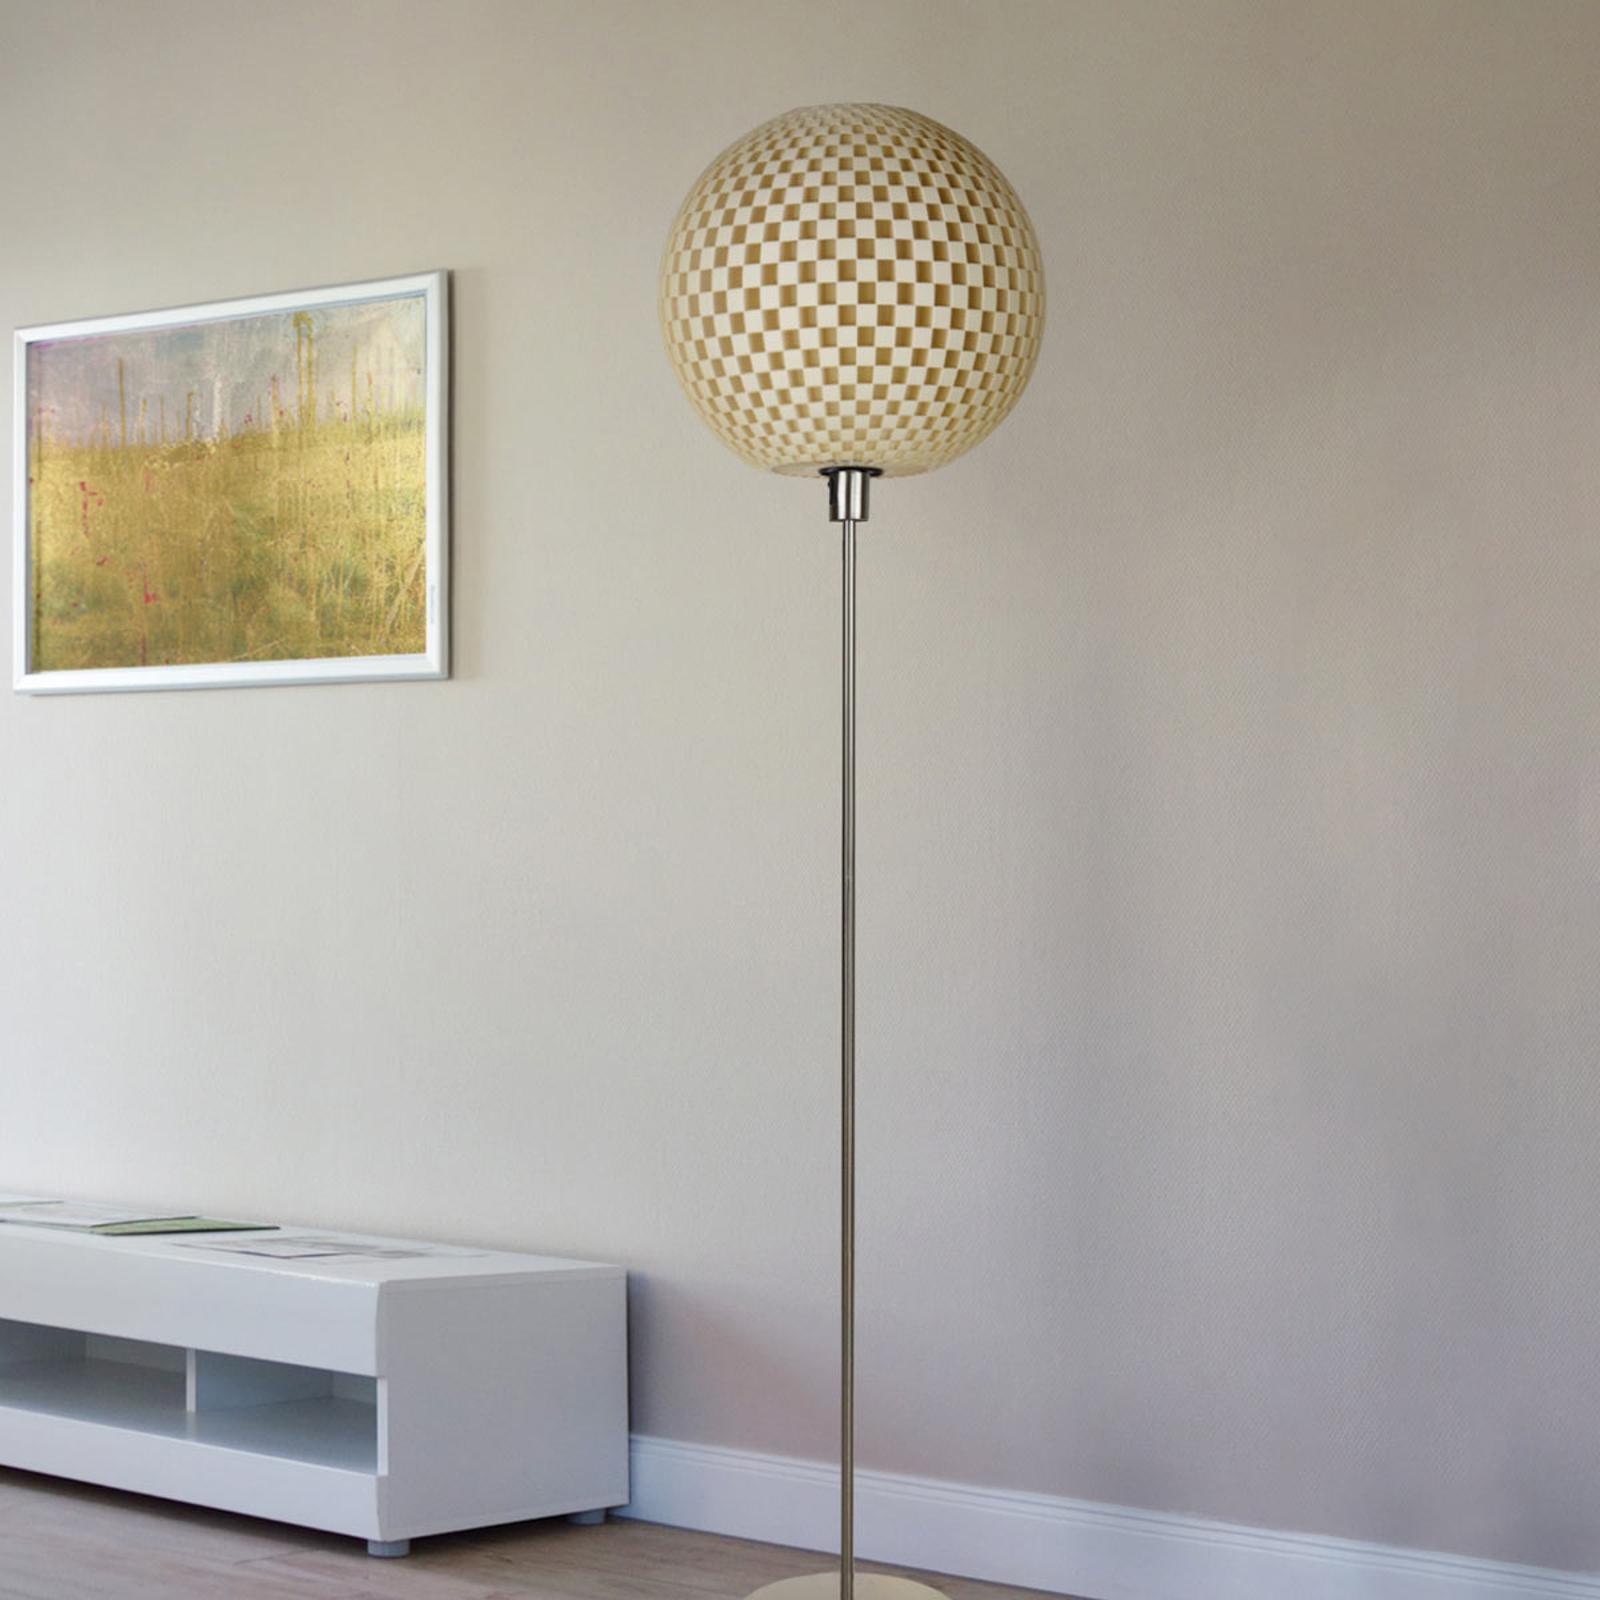 Ongewone design-vloerlamp Flechtwerk, linnen